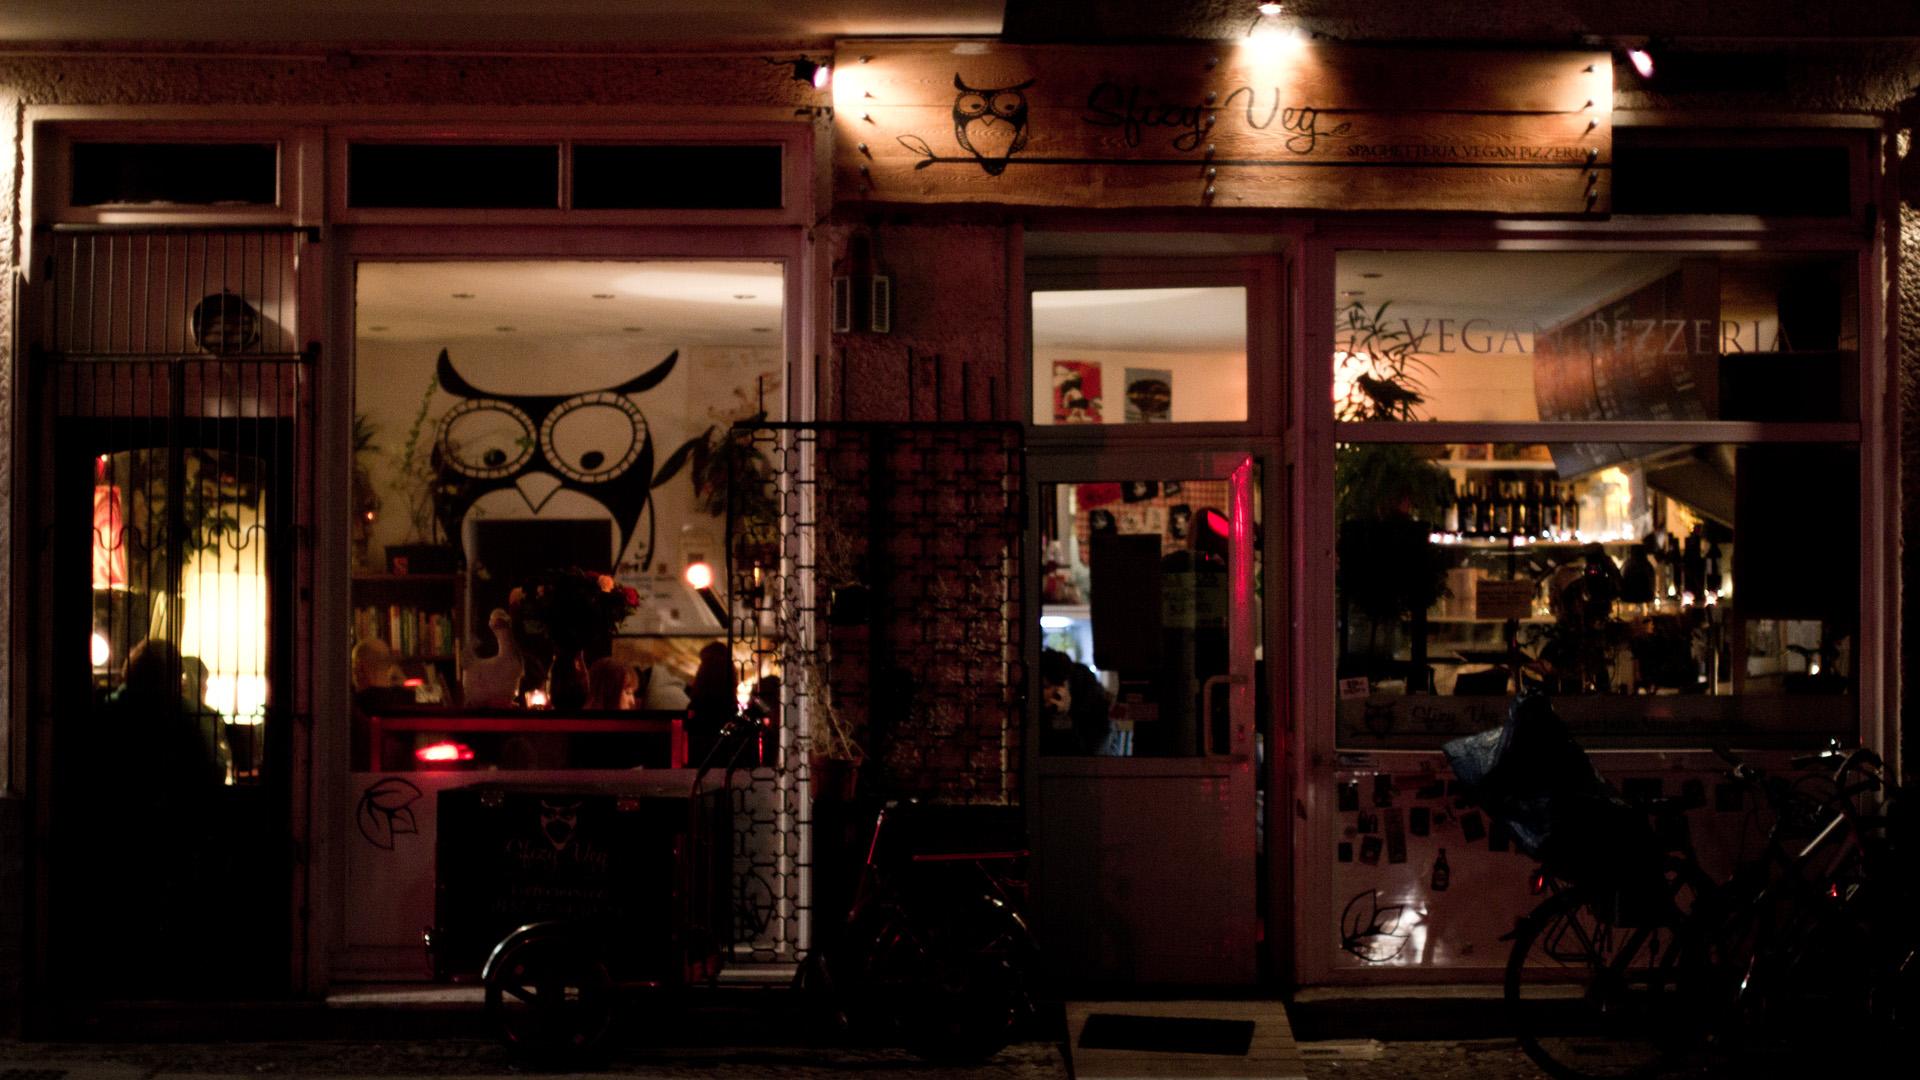 Berlin #4 Pizzeria Sfizy, Brunch im Viasko und Kreuzberg